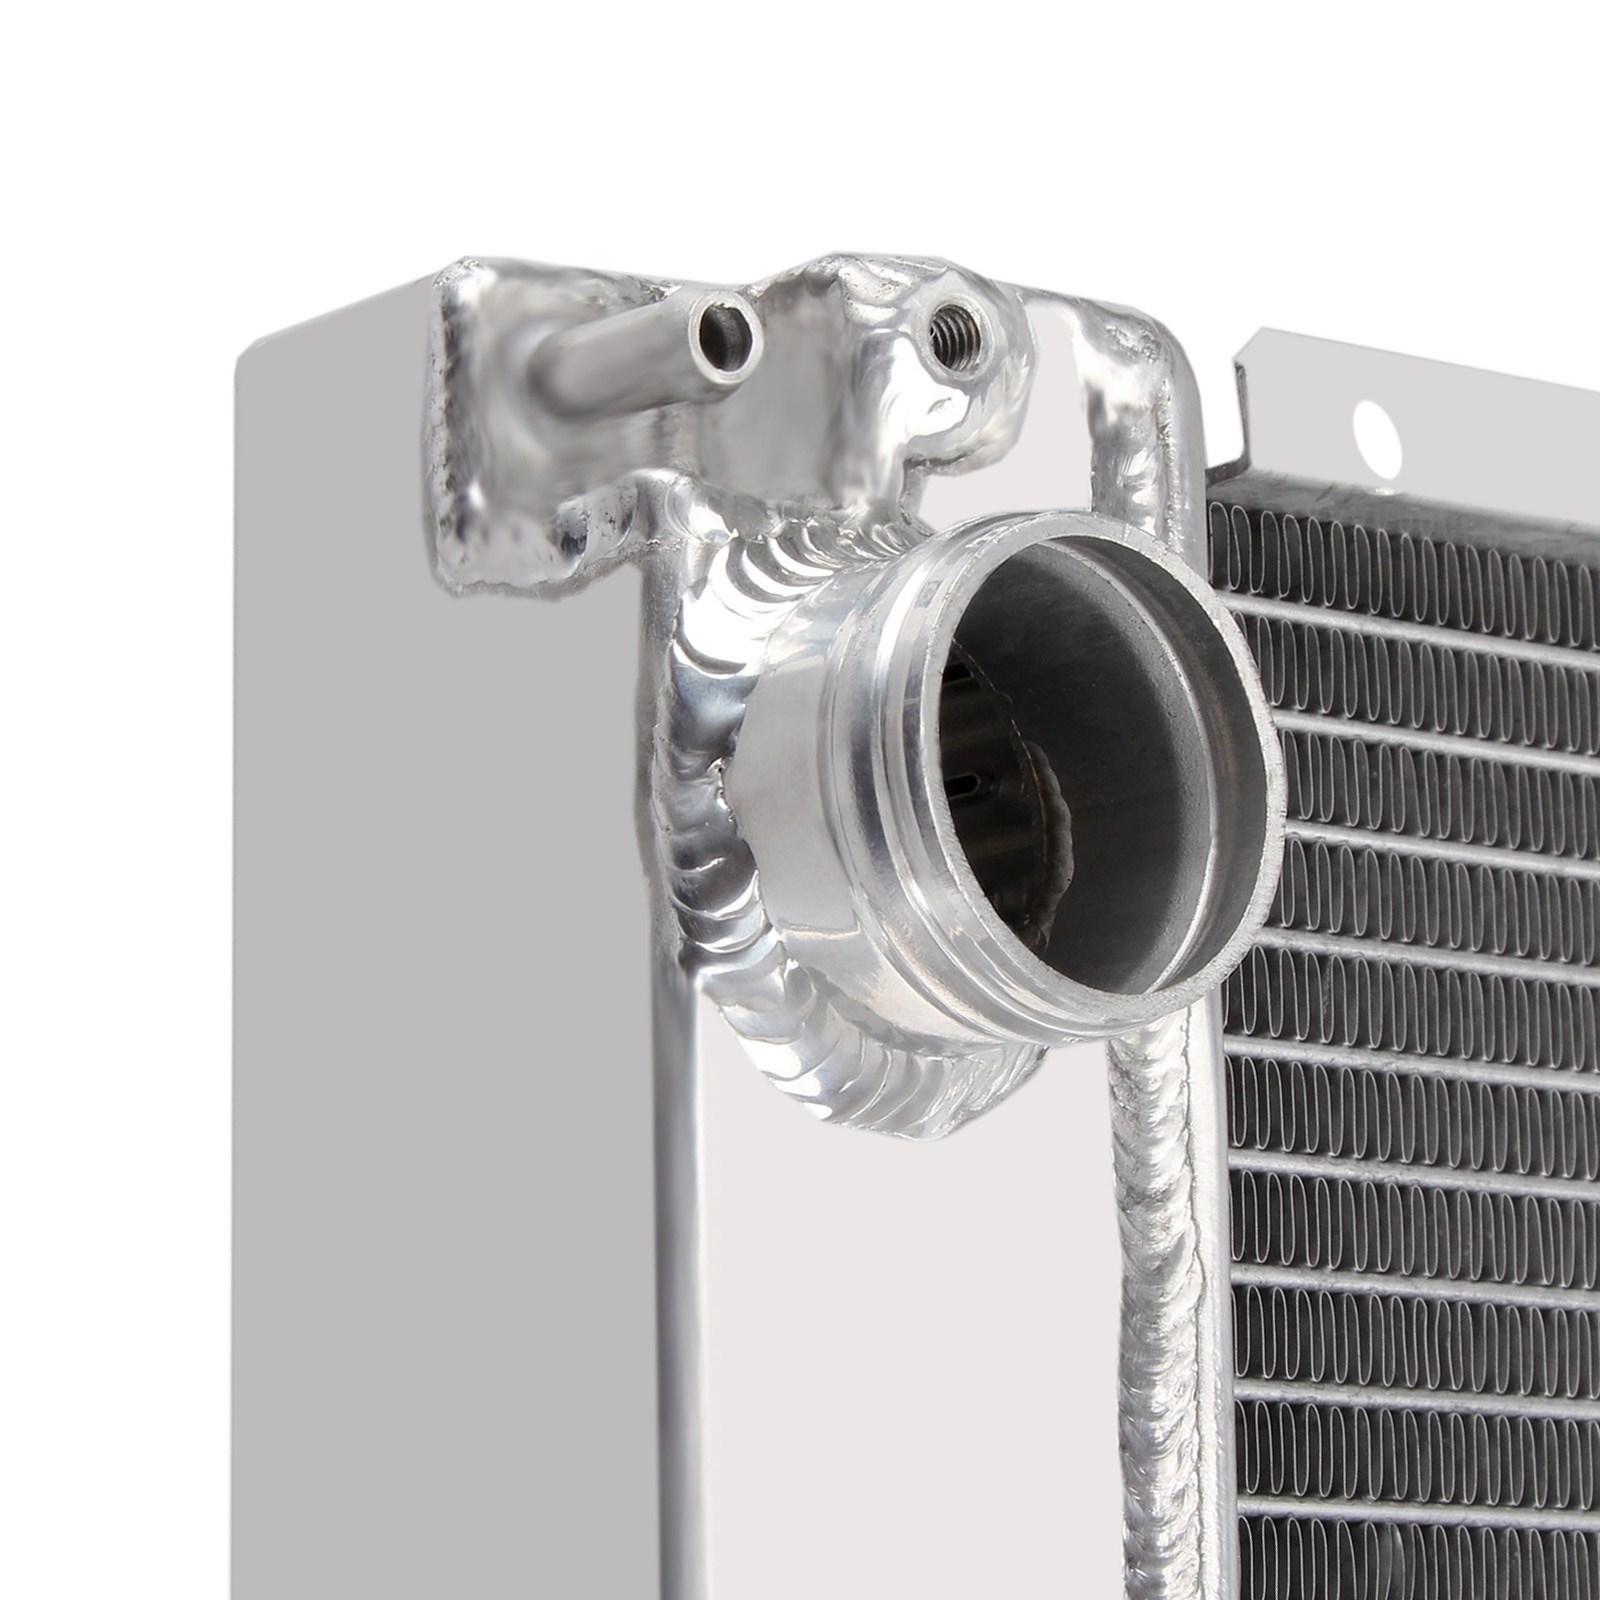 325 19922000 bmw radiator replacement x5 Dromedary company